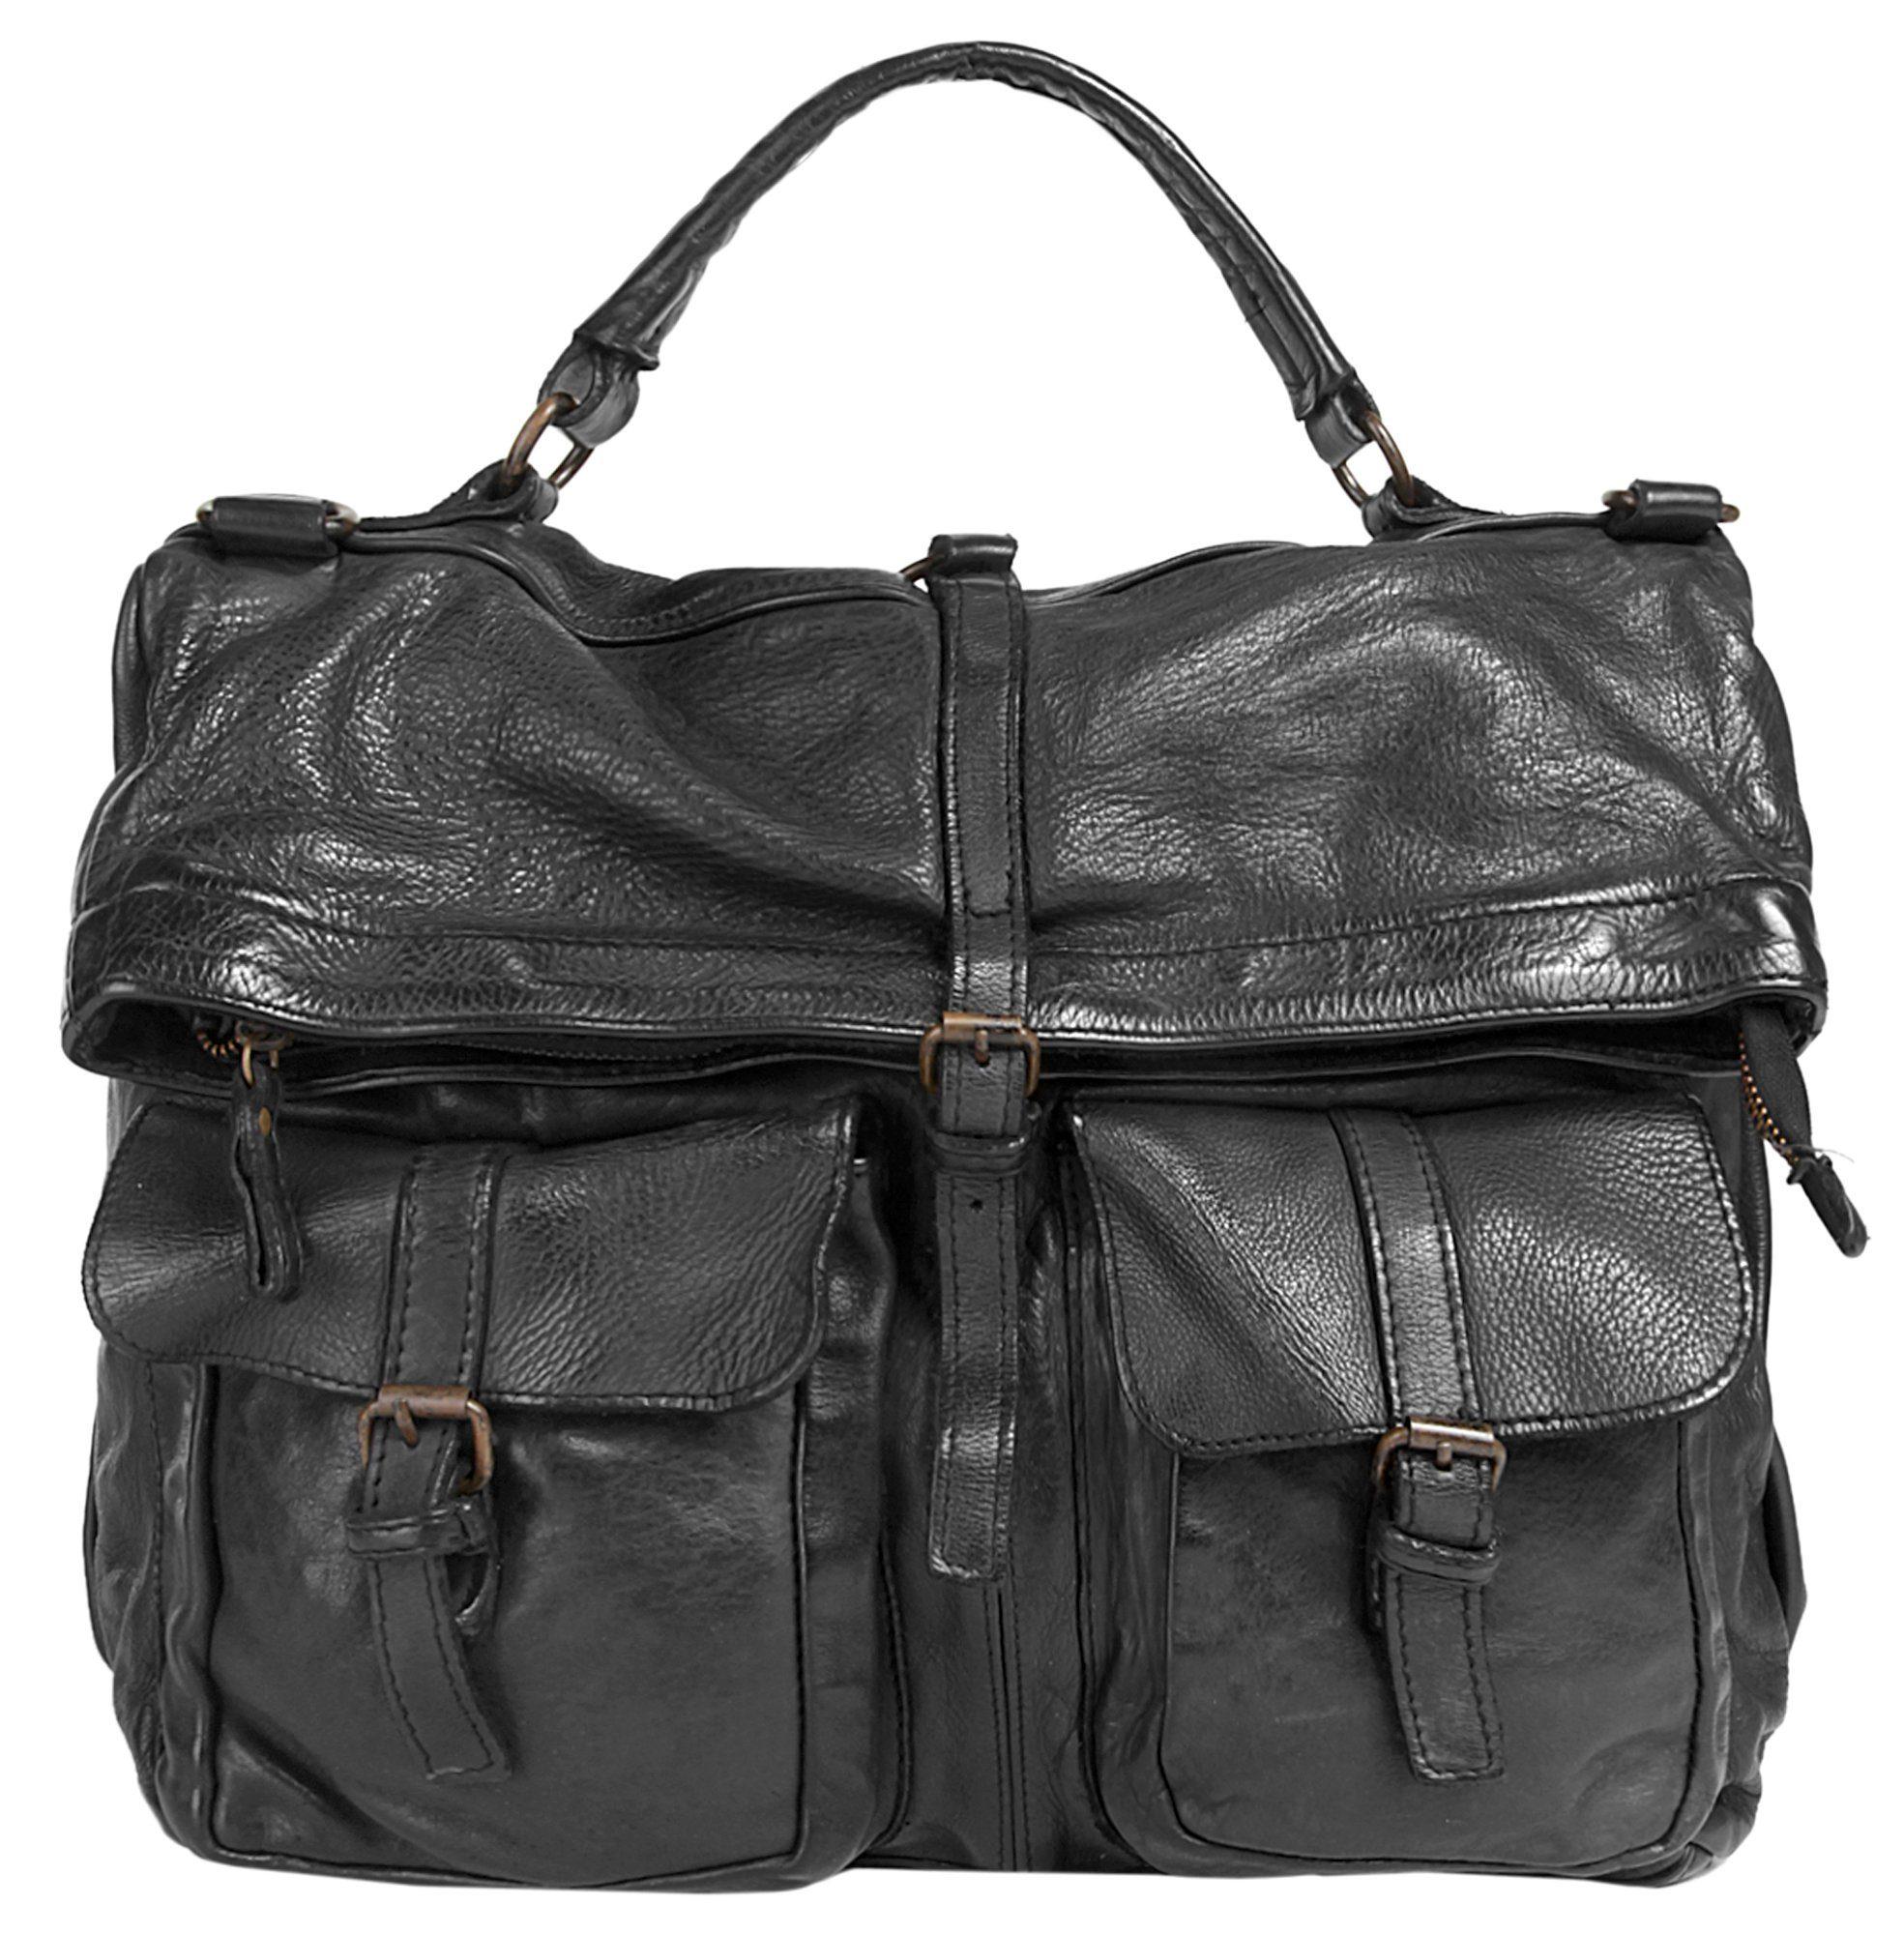 Cluty Rucksack-Tasche